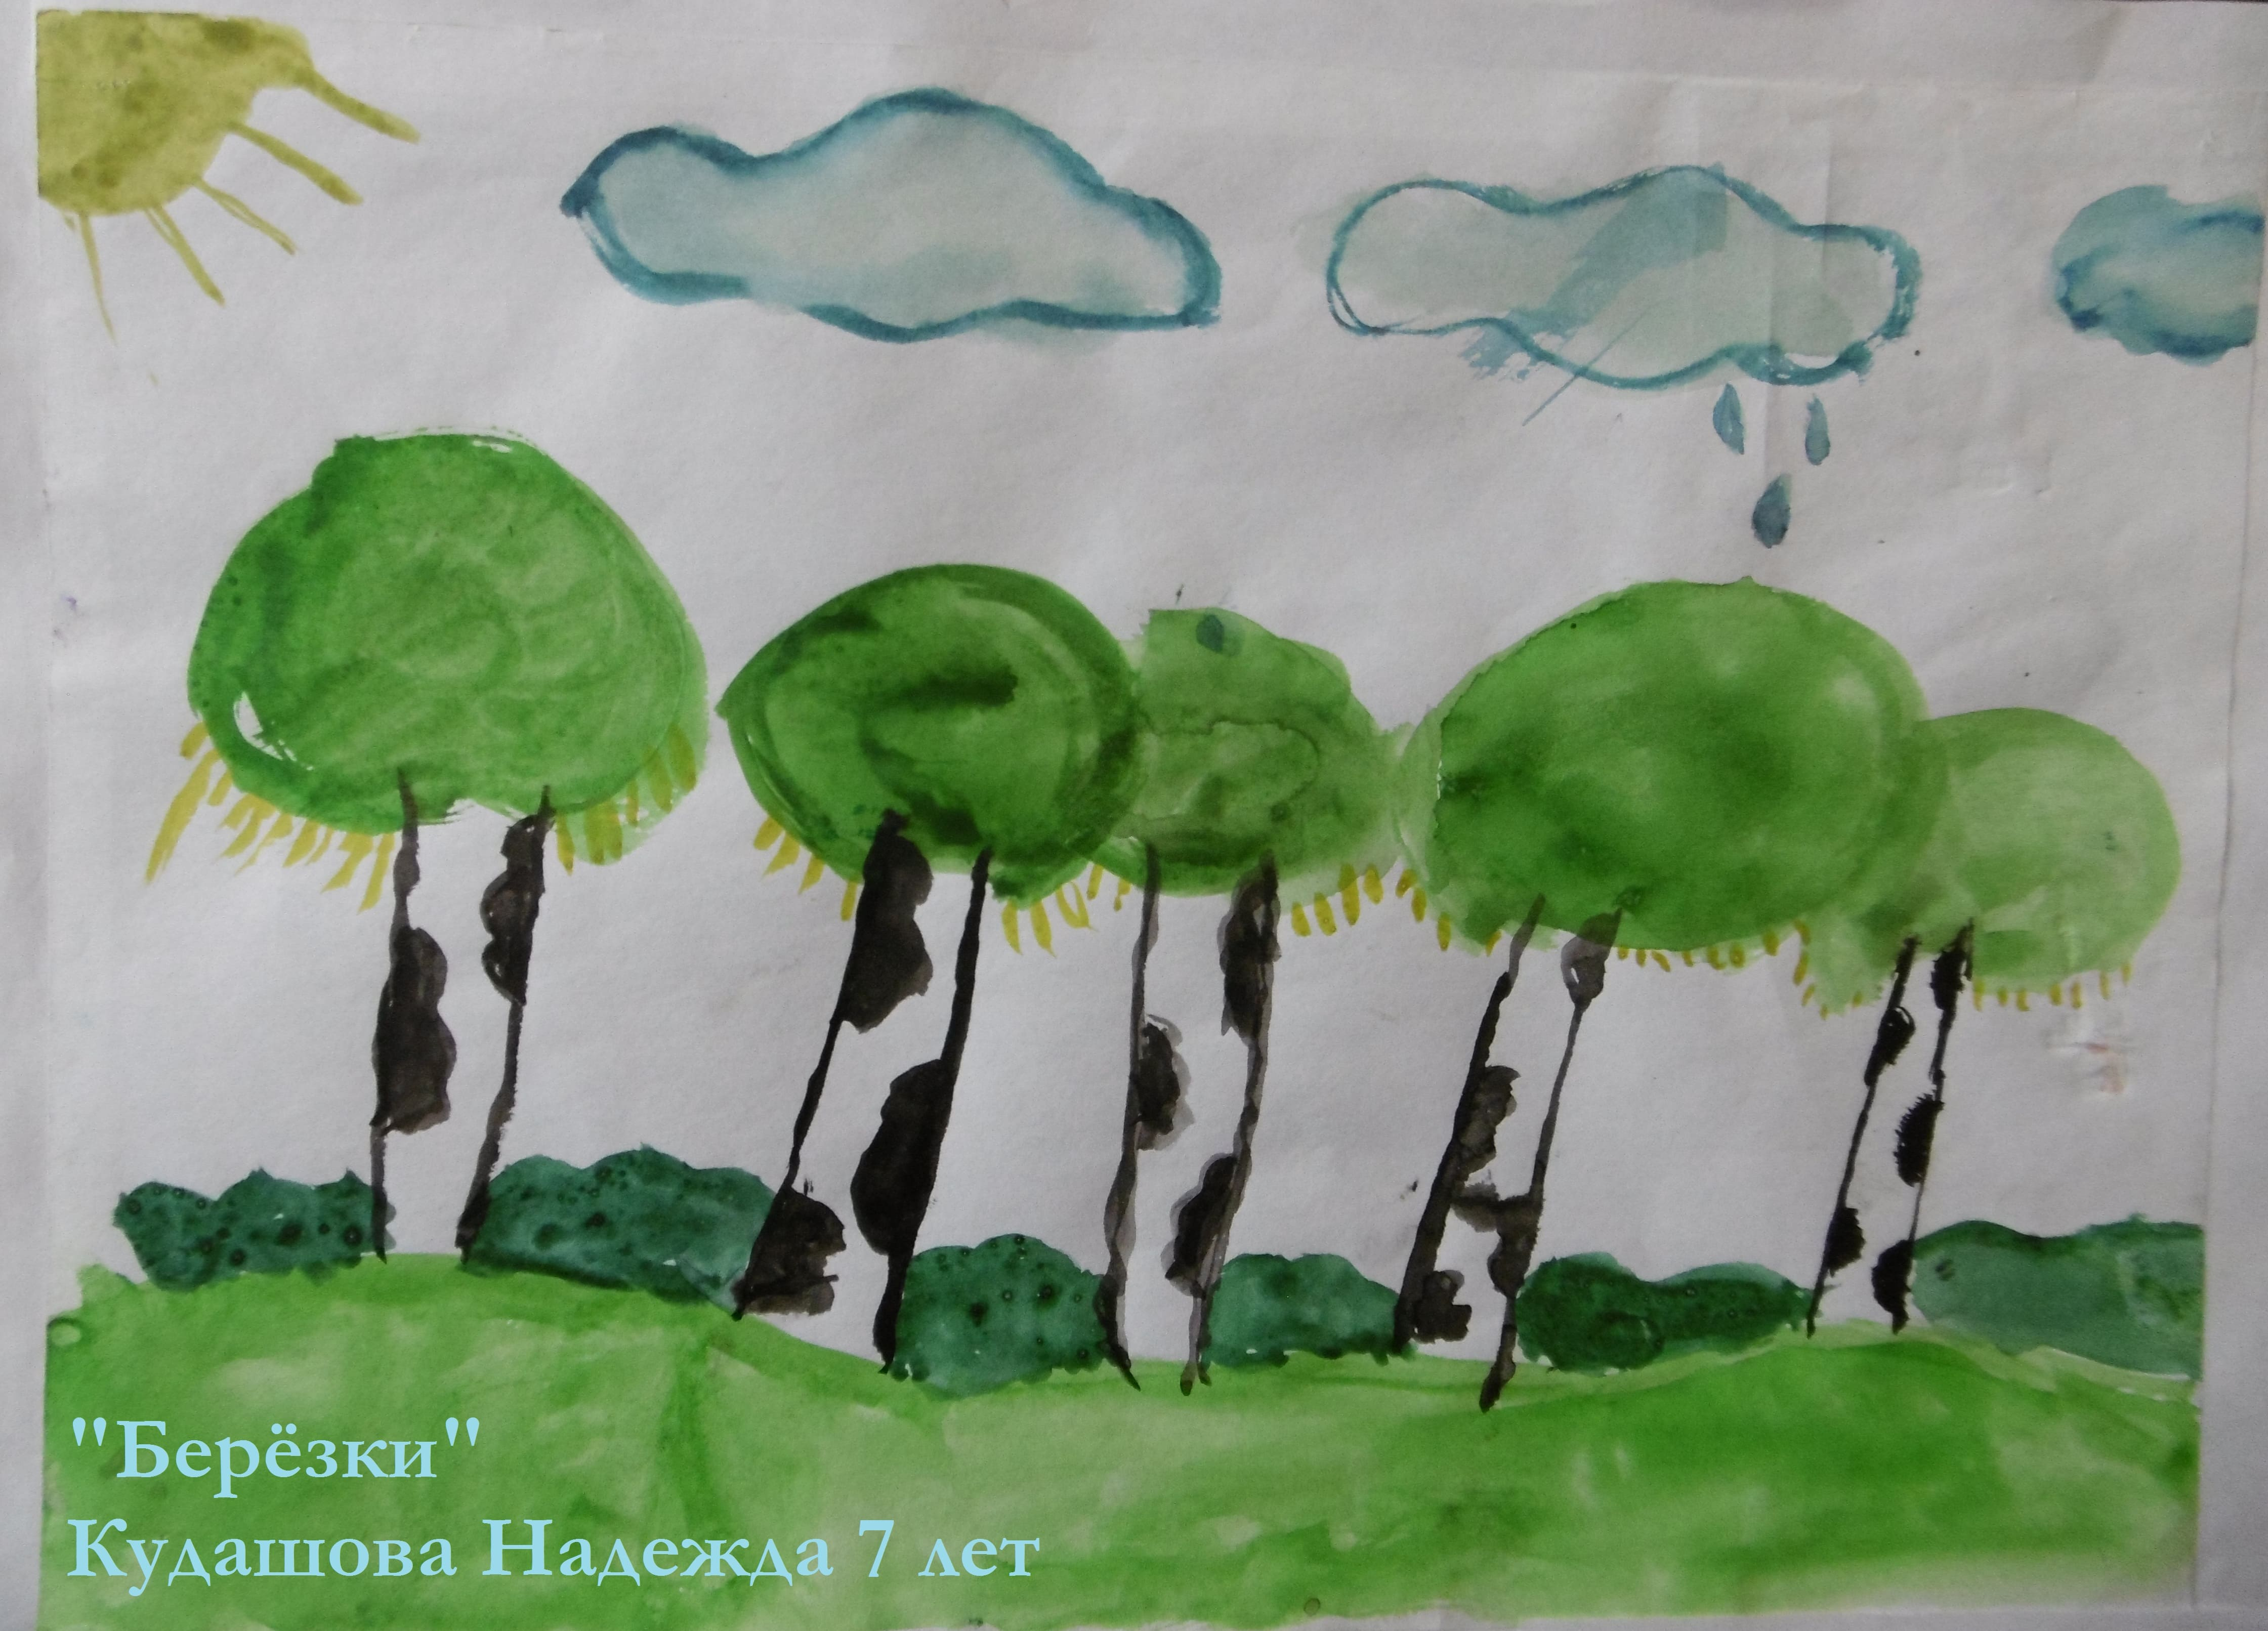 Кудашова Надежда 7 лет БЕРЁЗКИ